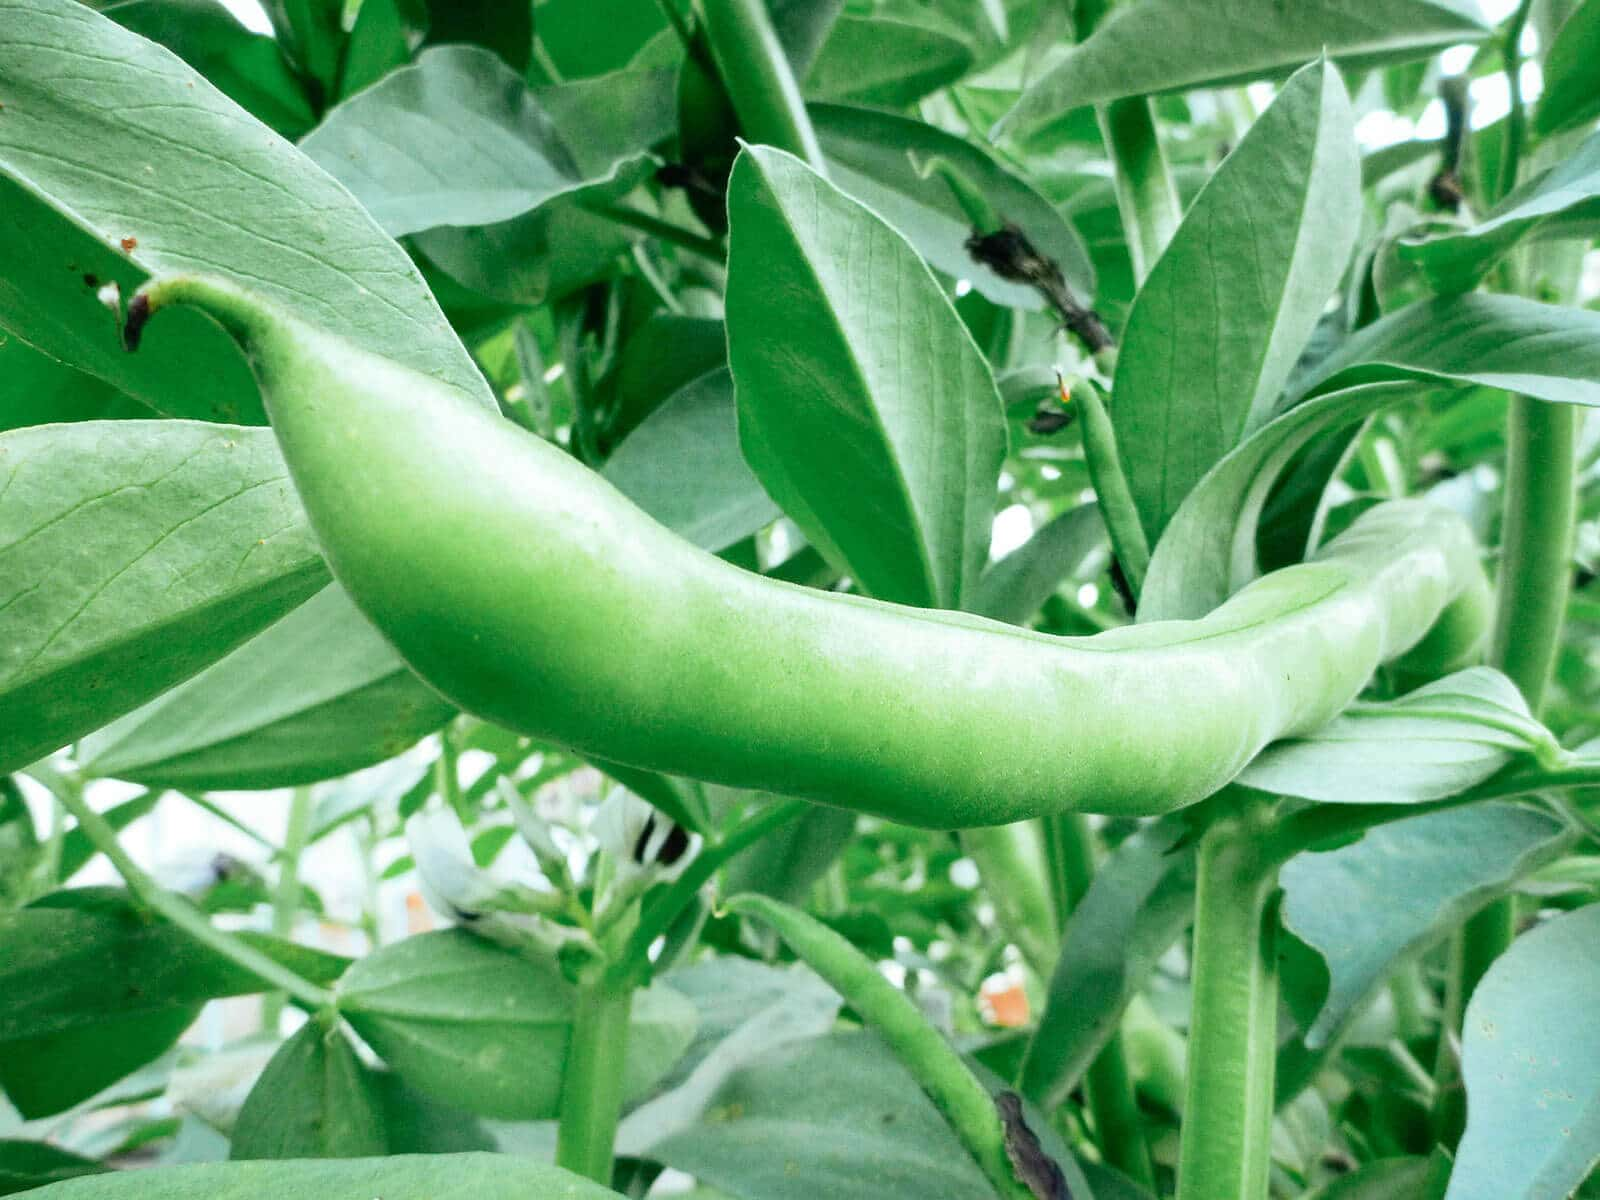 Close-up of mature fava bean pod